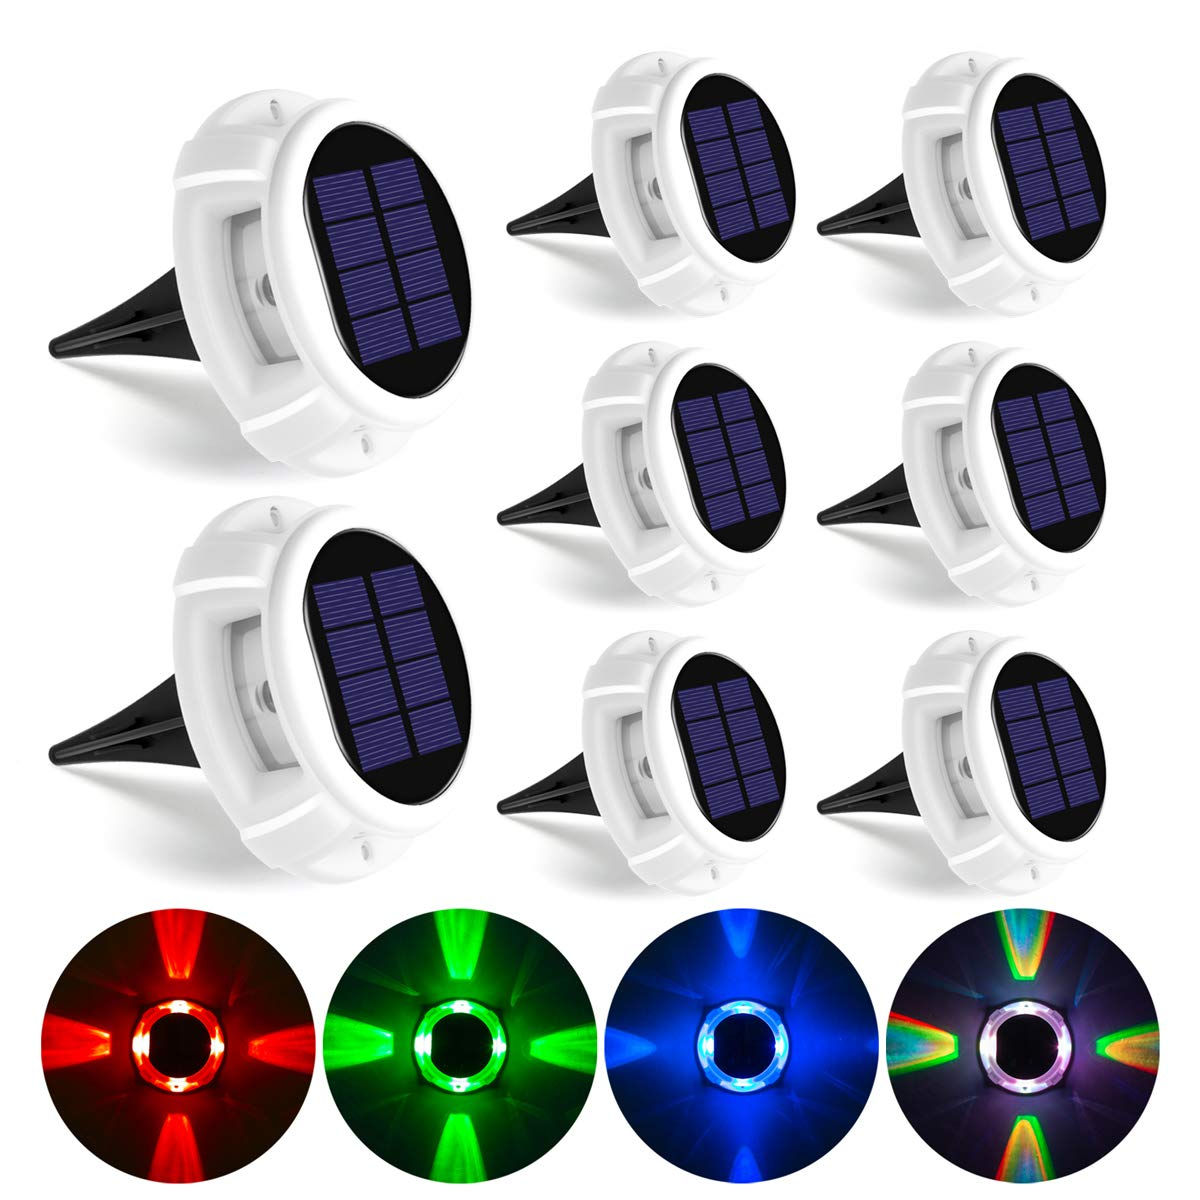 GIGALUMI Solar Ground Lights